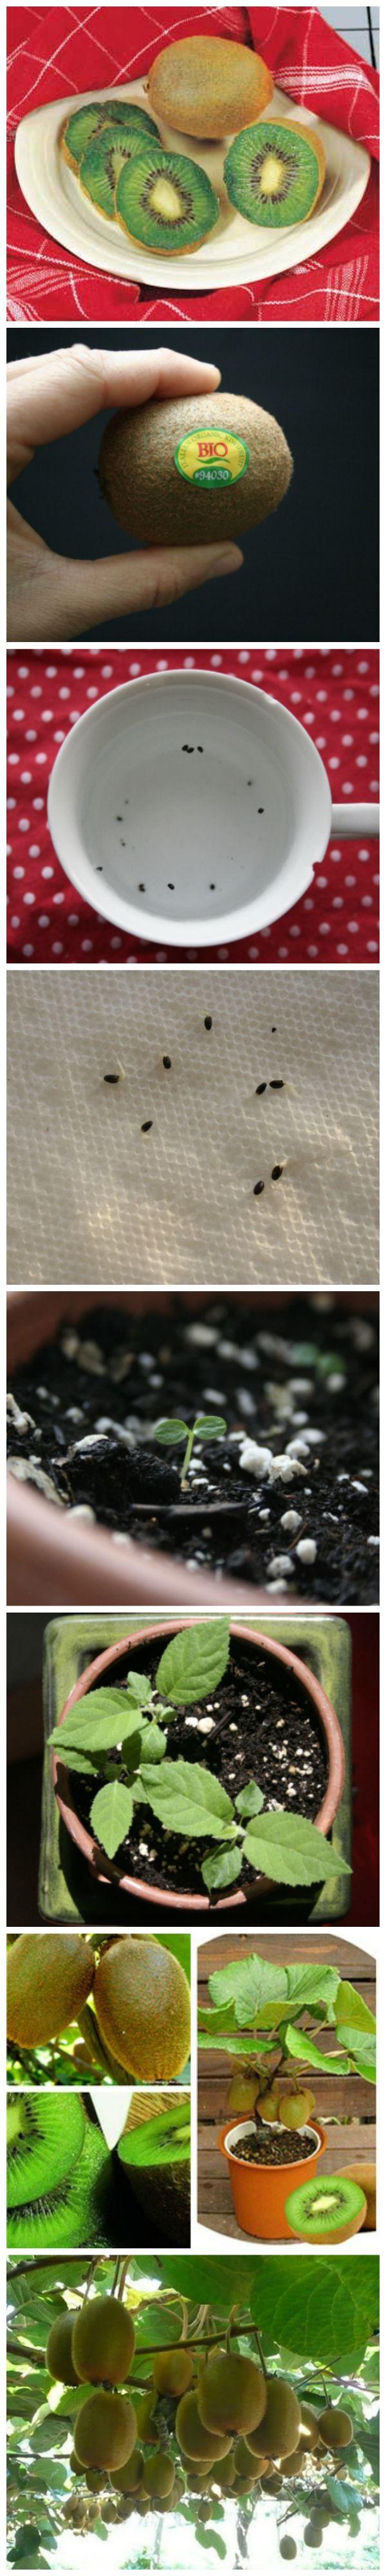 Cultivar kiwi a través de las semillas | How To Grow A Kiwi Plant From Seed – DIY